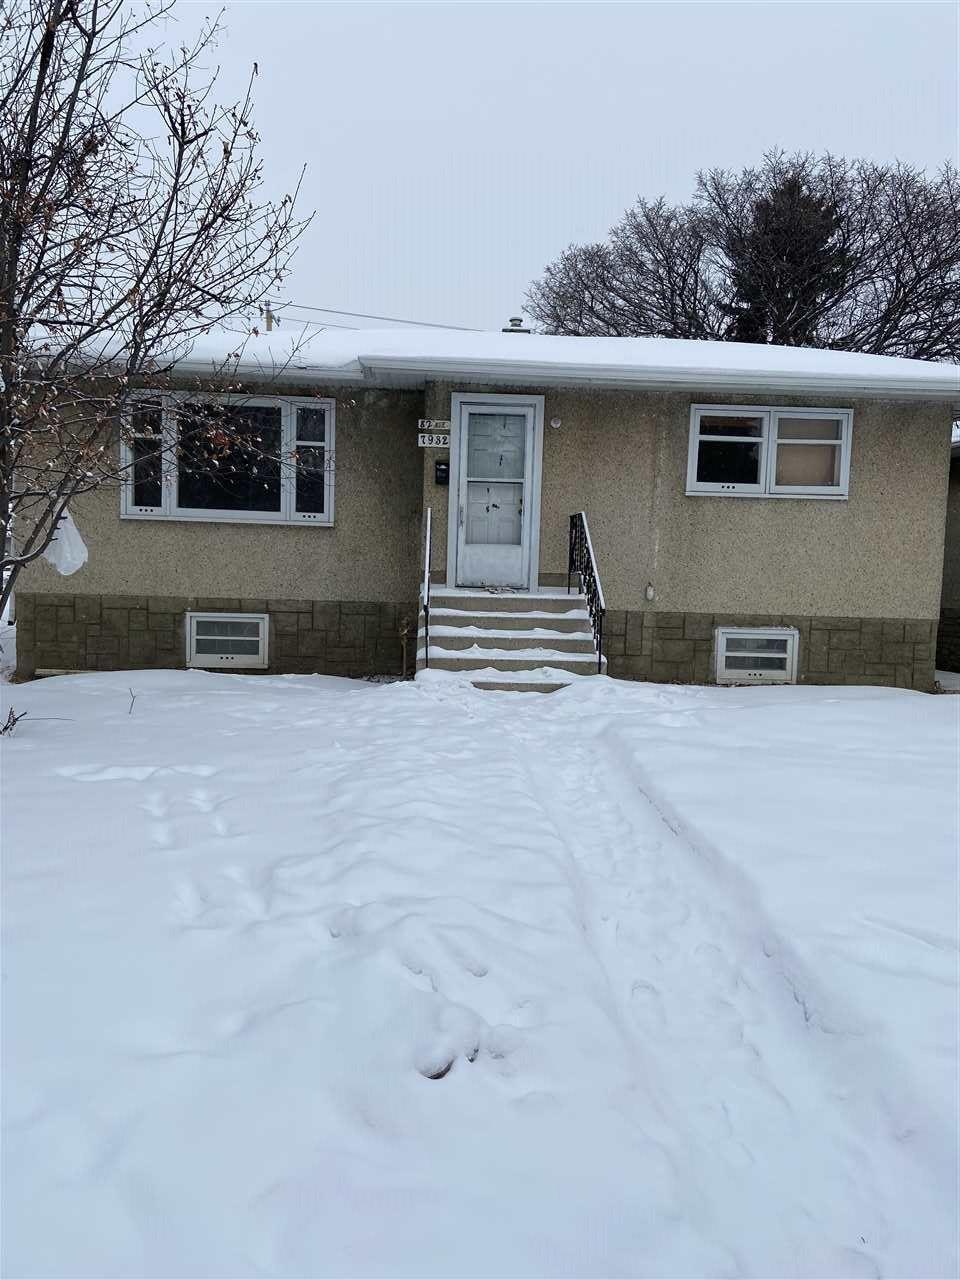 Main Photo: 7932 82 Avenue in Edmonton: Zone 18 House for sale : MLS®# E4227904